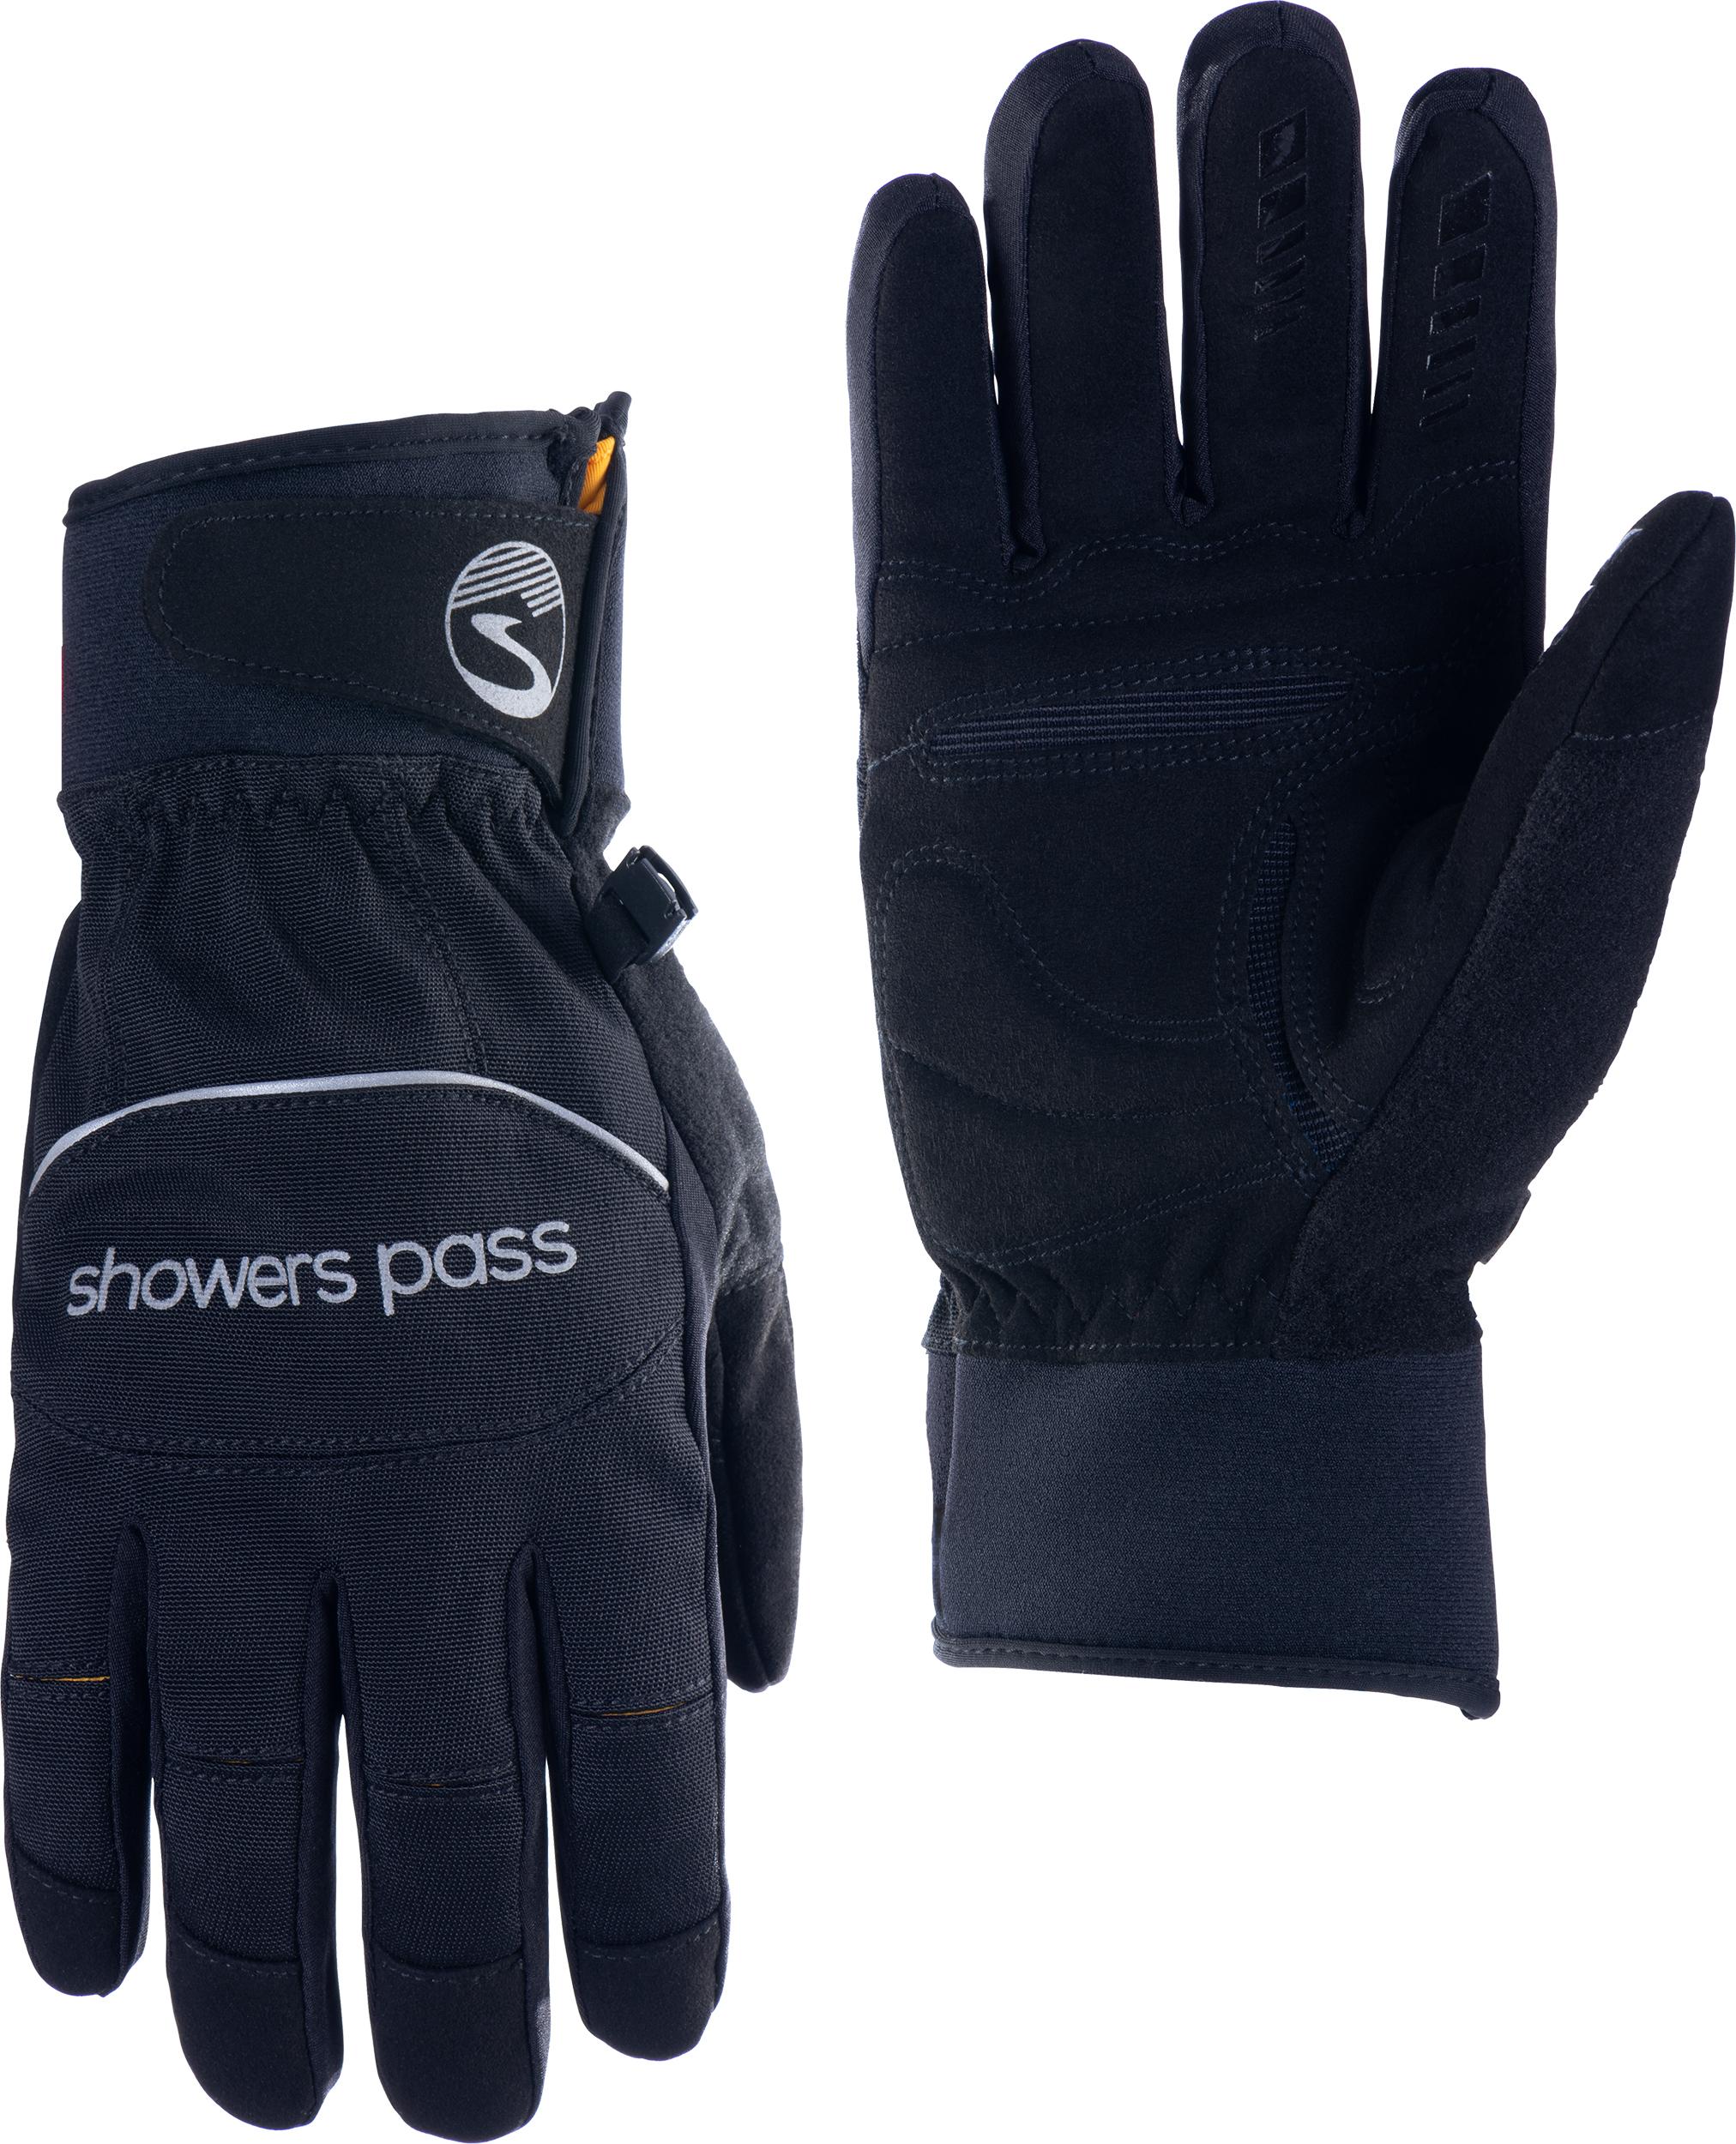 Black 5ive Star Gear Performance Softshell Waterproof Glove